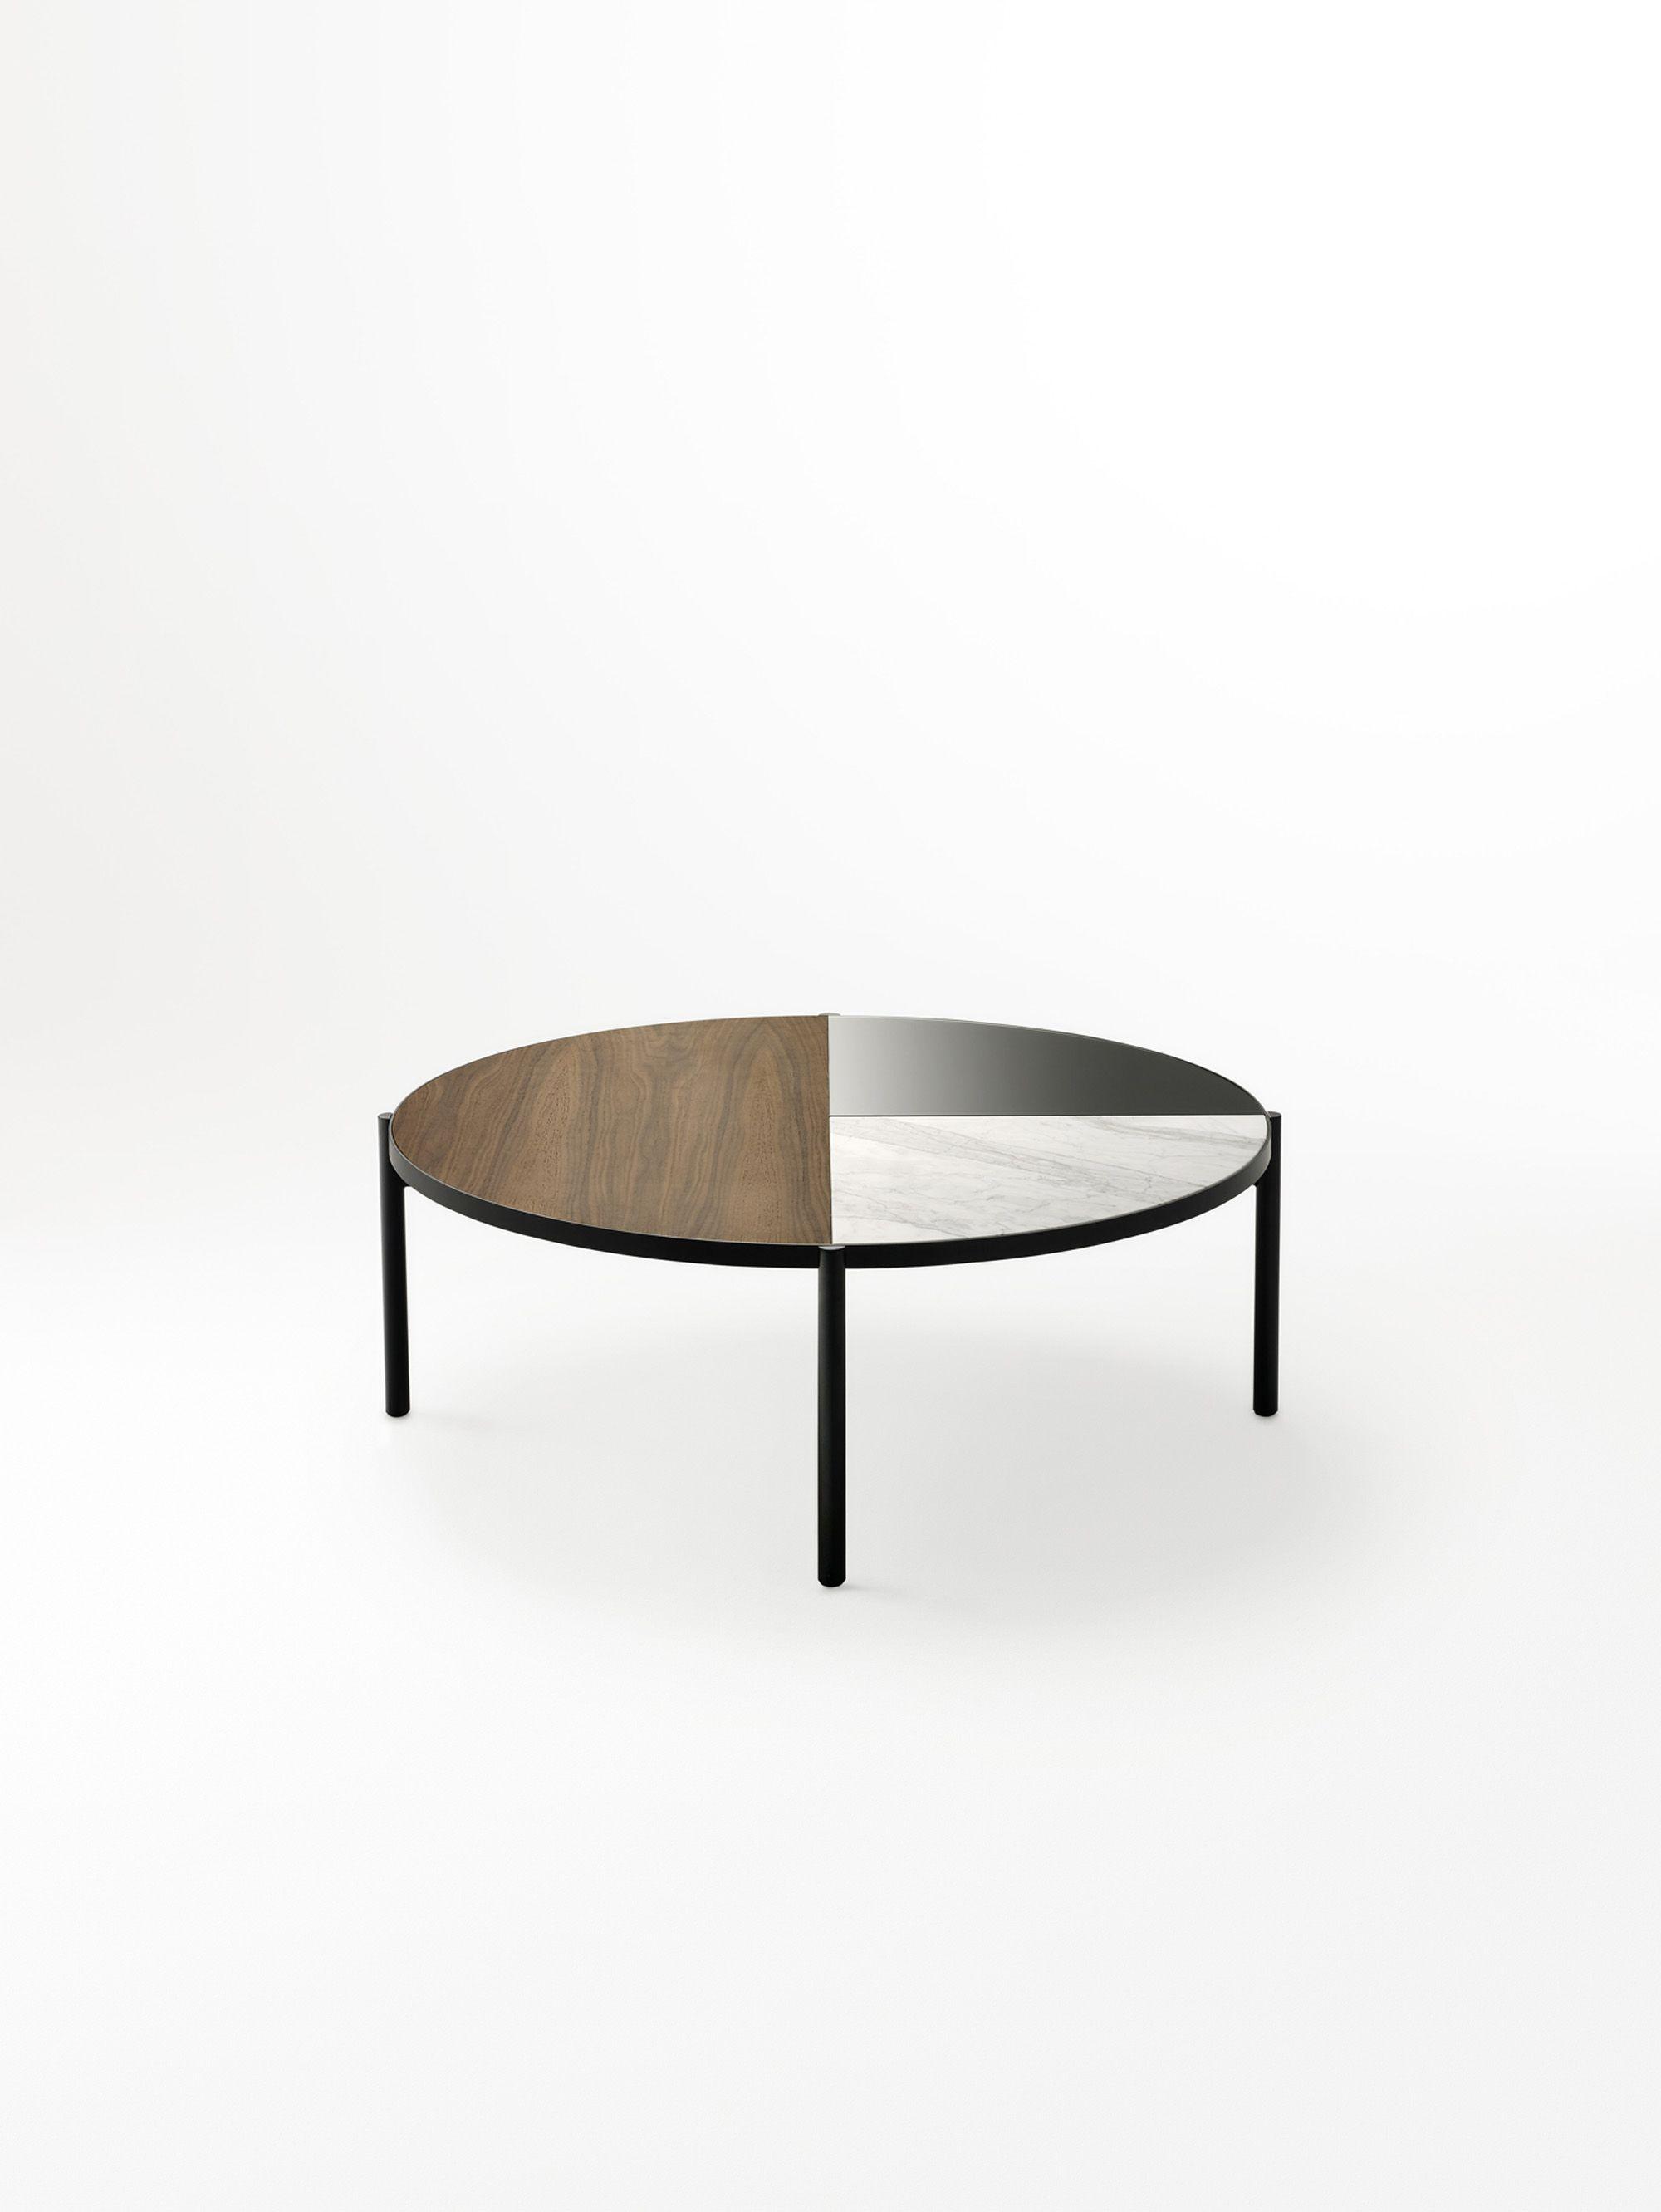 Noon Table Tri Cut Ross Gardam Melbourne Australia Coffee Furniture